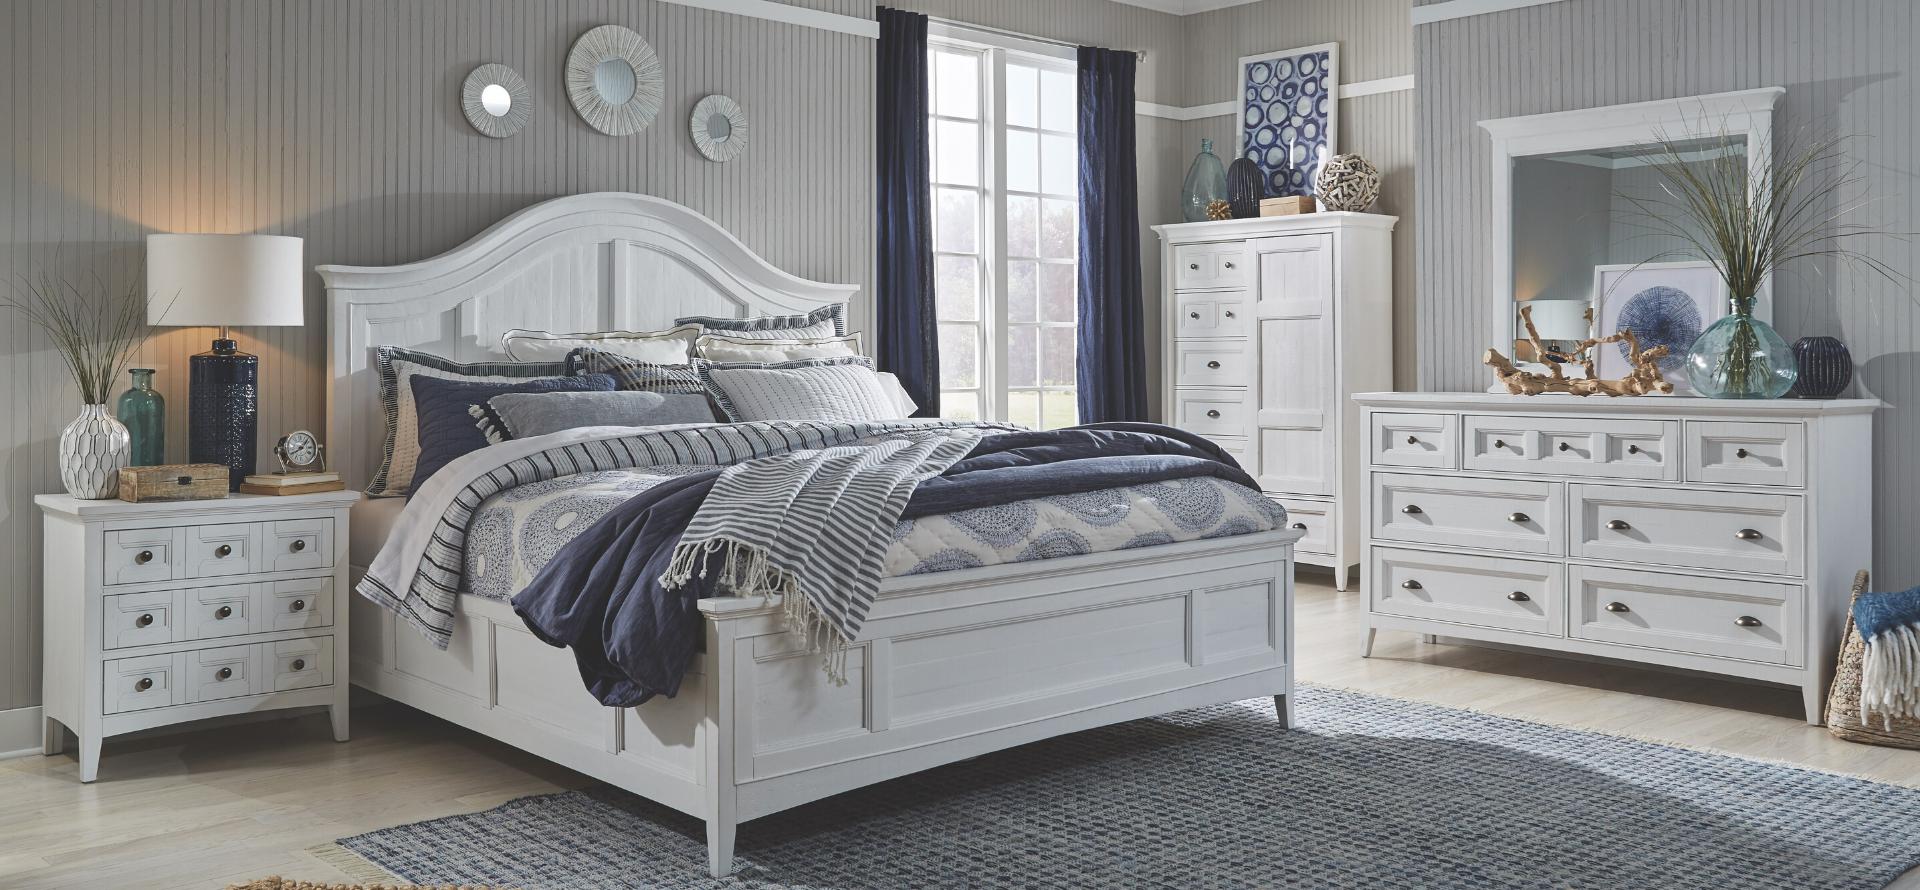 Heron Cove Bedroom